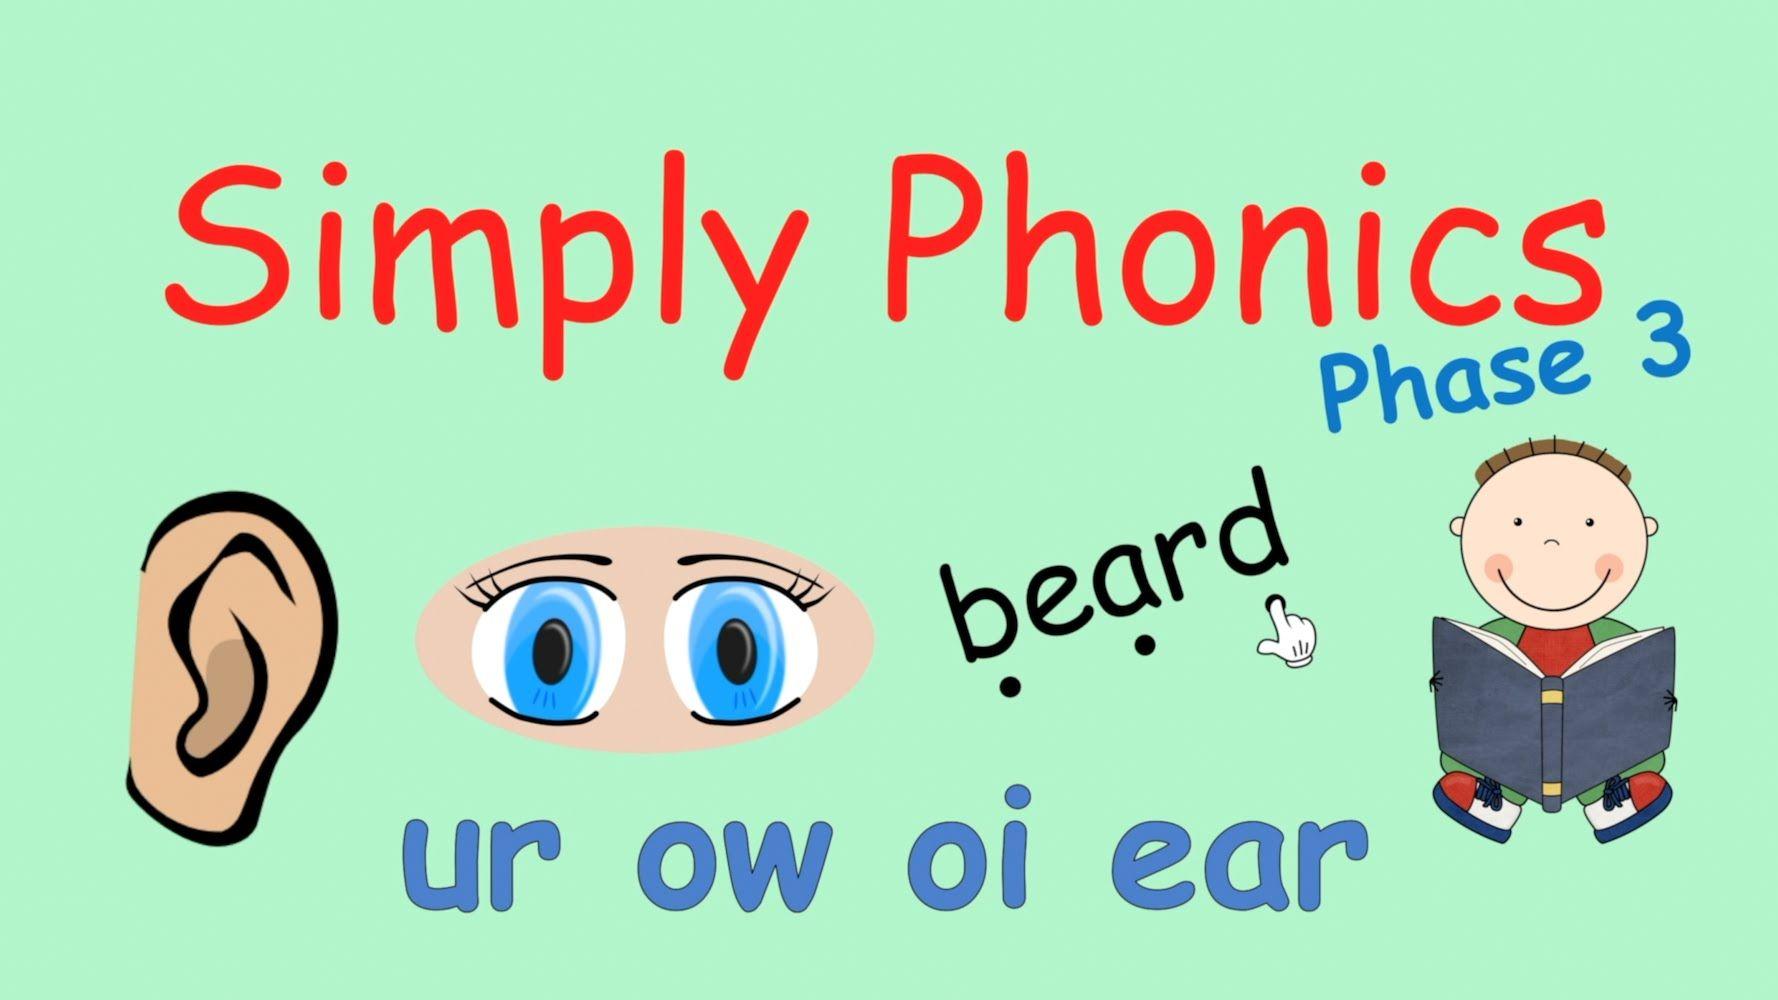 Simply Phonics Phase 3 Phonics